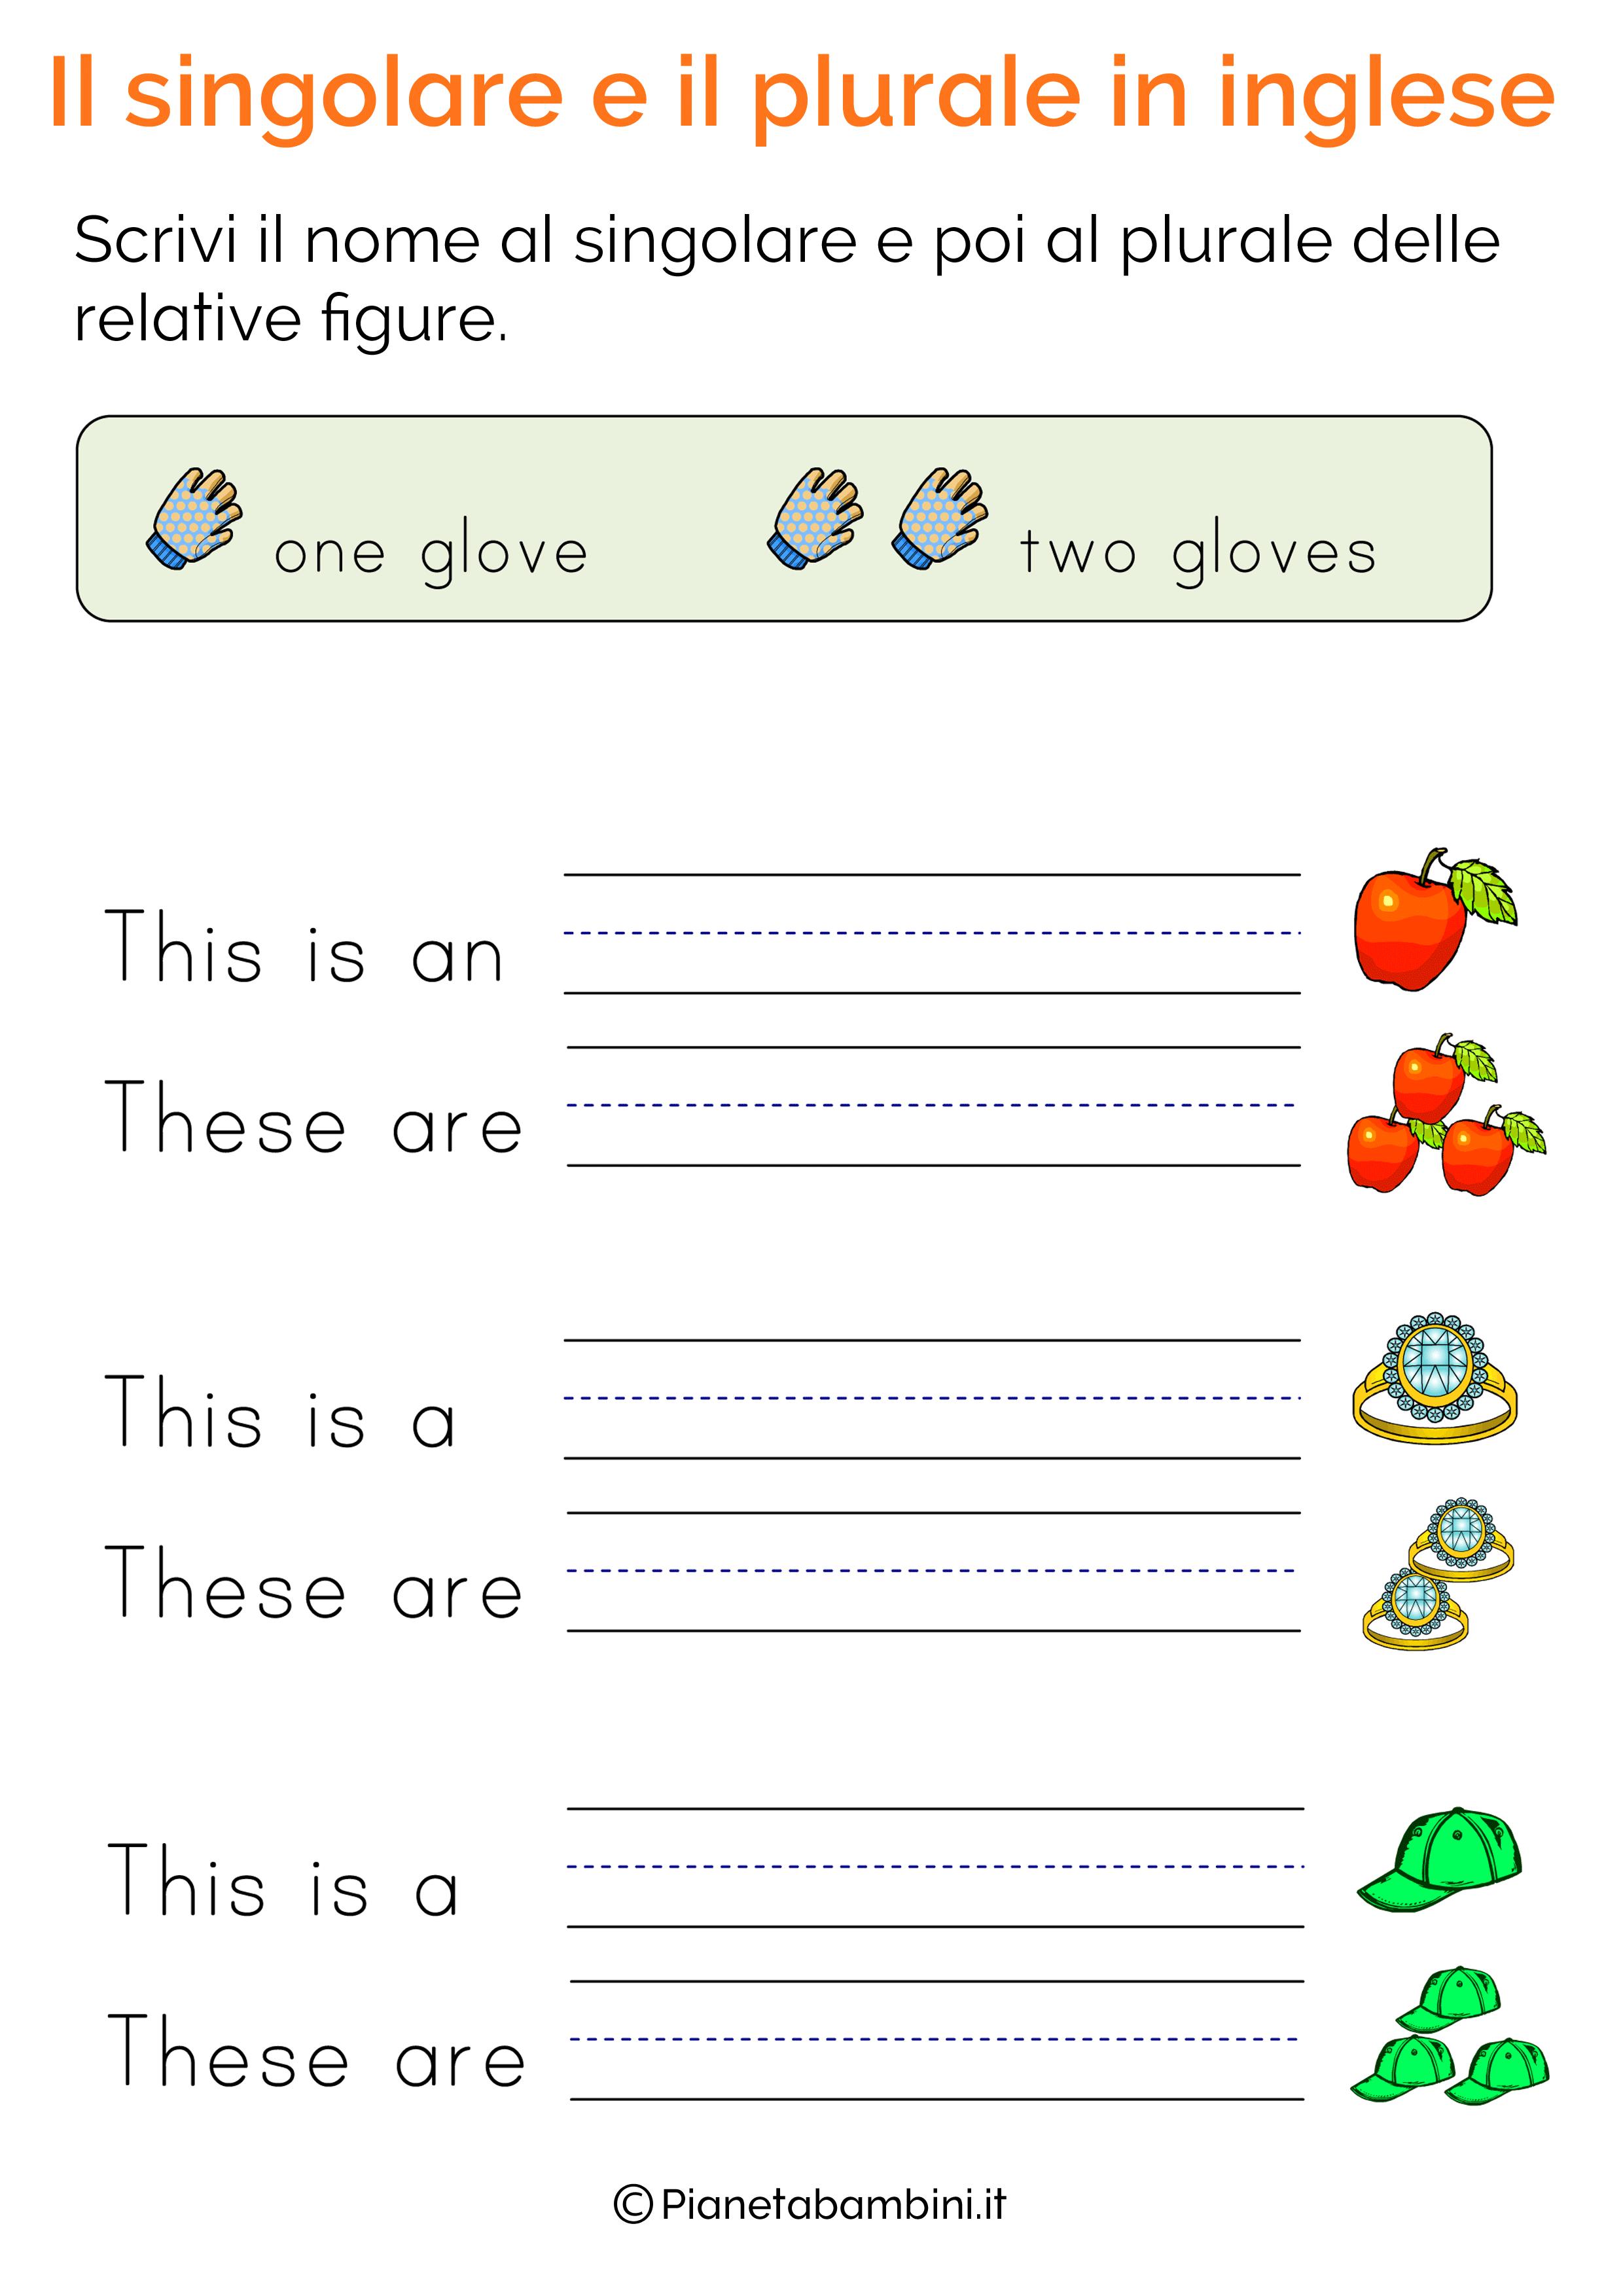 Esercizi-Singolare-Plurale-Inglese-10